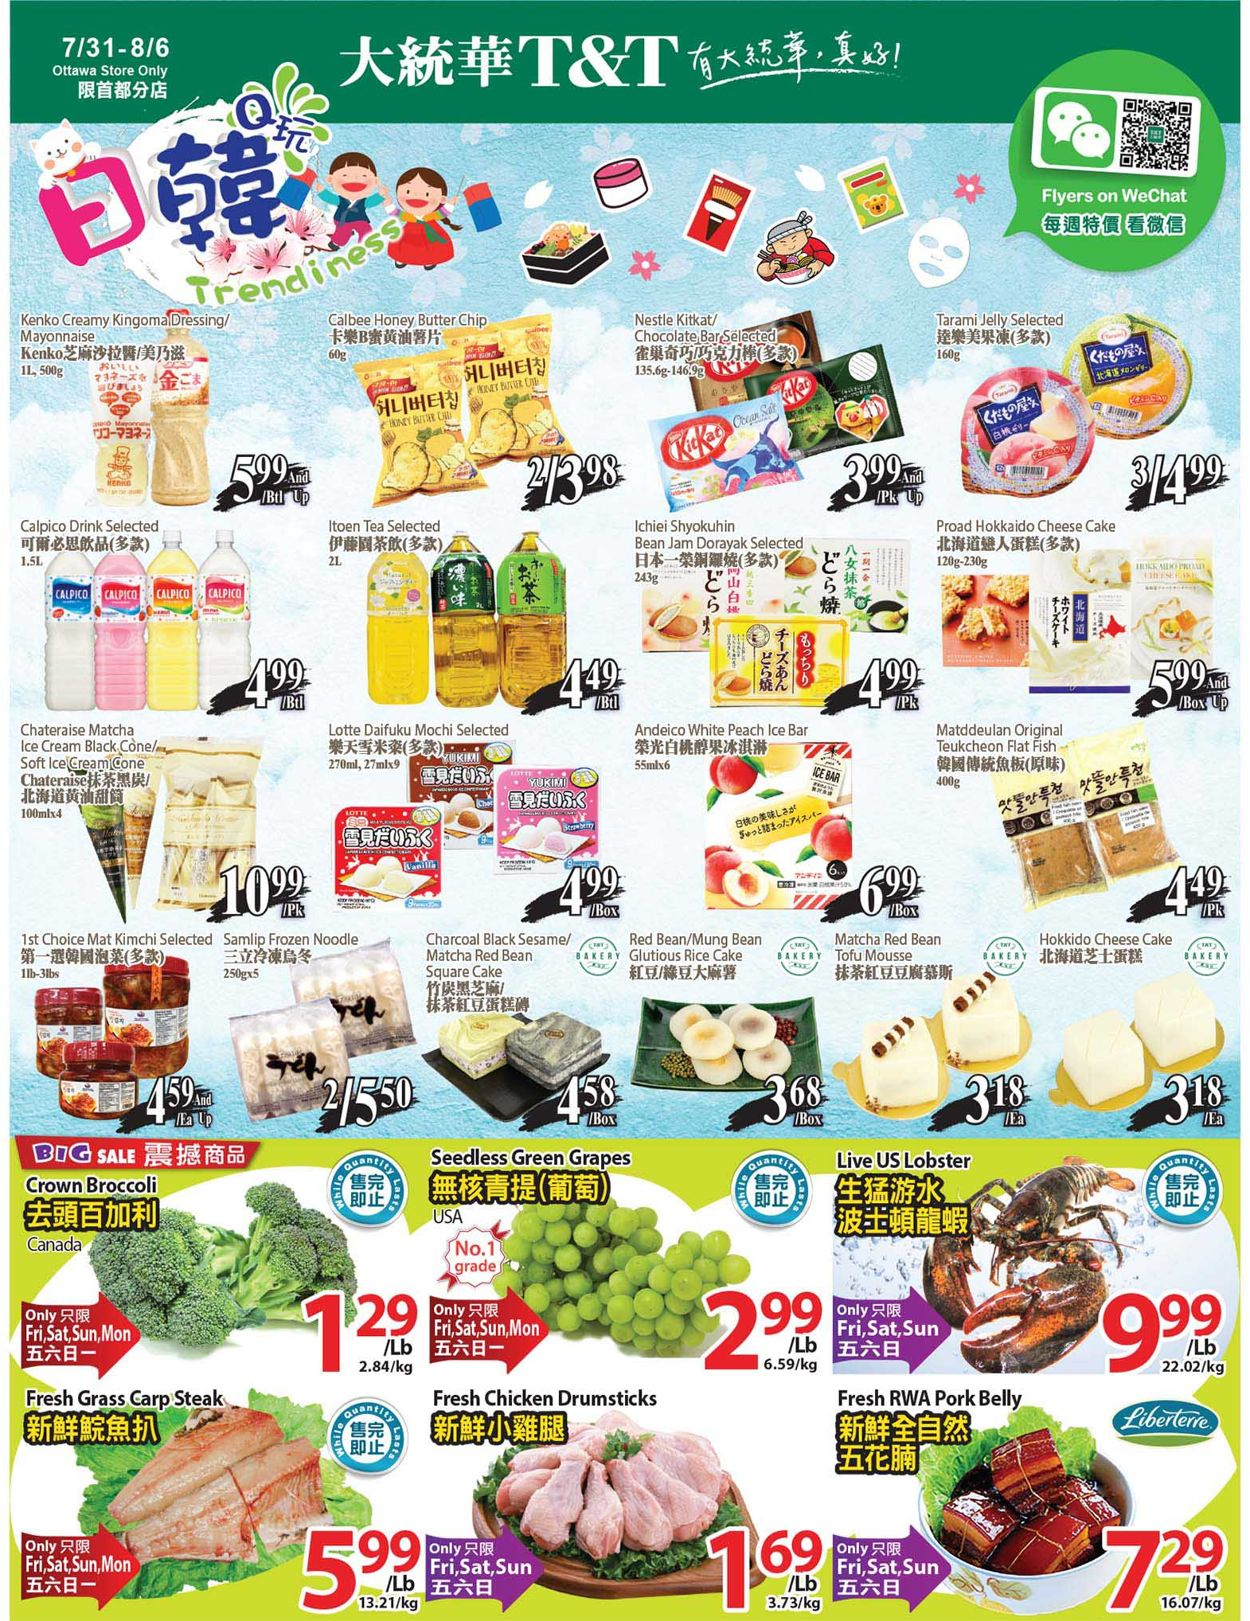 T&T Supermarket Flyer - 07/31-08/06/2020